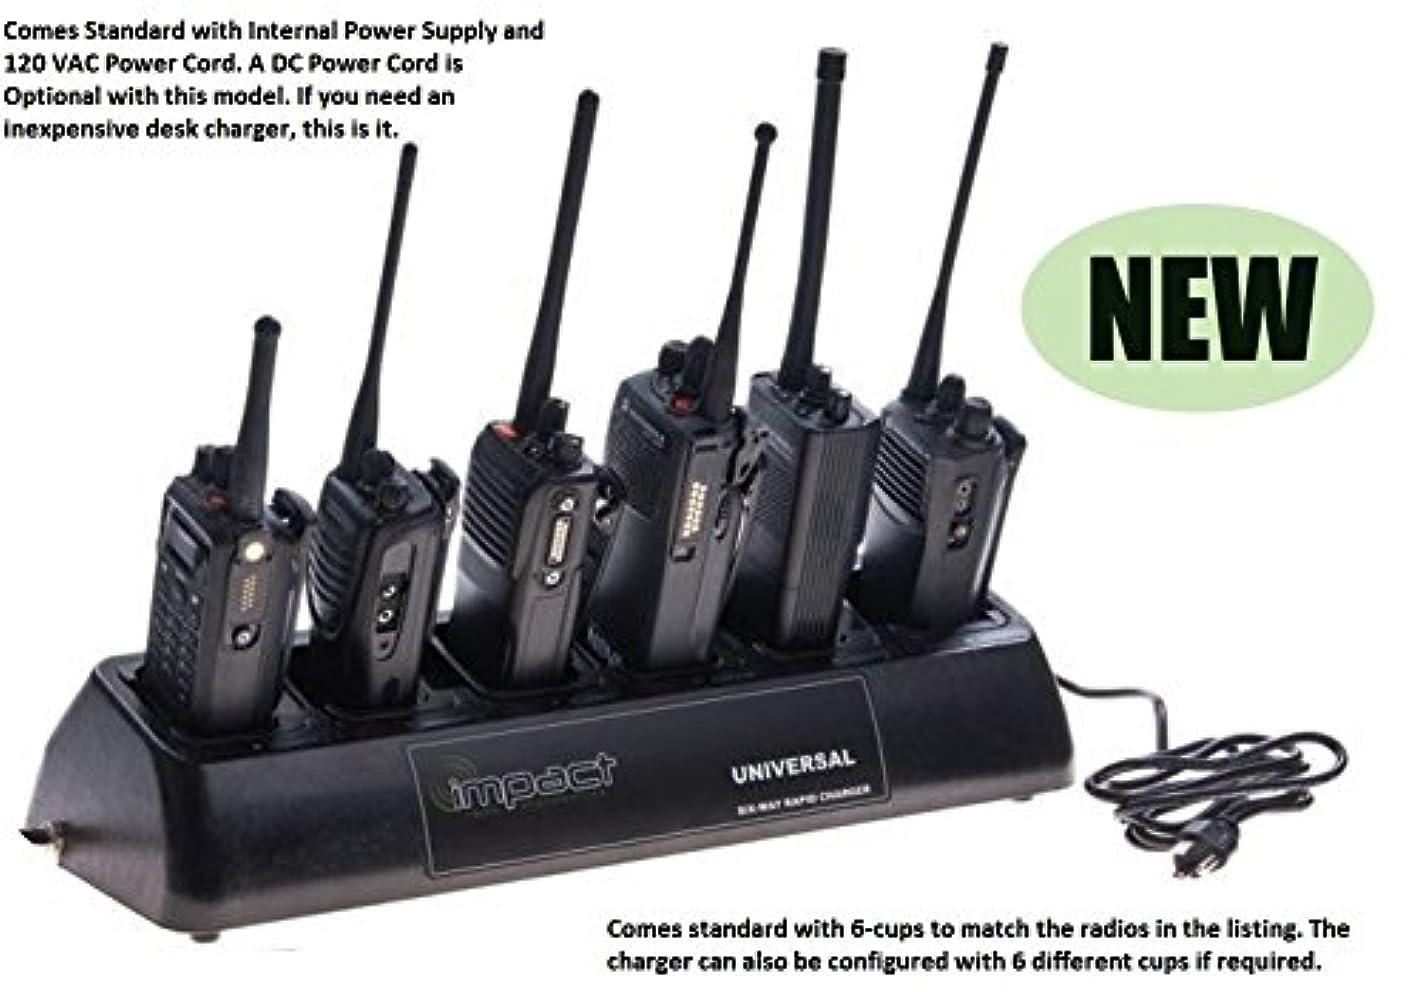 Impact Quad Chemistry Six Bay 120 Volt AC & 12 Volt DC (Optional) Portable Radio Battery Charger fits: Kenwood Radio Models: TK2140 / TK3140 / TK2160 / TK3160 / TK2170 / TK3170 / TK2360 / TK3360 / TK3173 / TH-072A / Nexedge NX200 / Nexedge NX320, Battery Models: KNB24L / KNB25A / KNB26N / KNB35L / KNB40LC / KNB55L / KNB56N / KNB57L